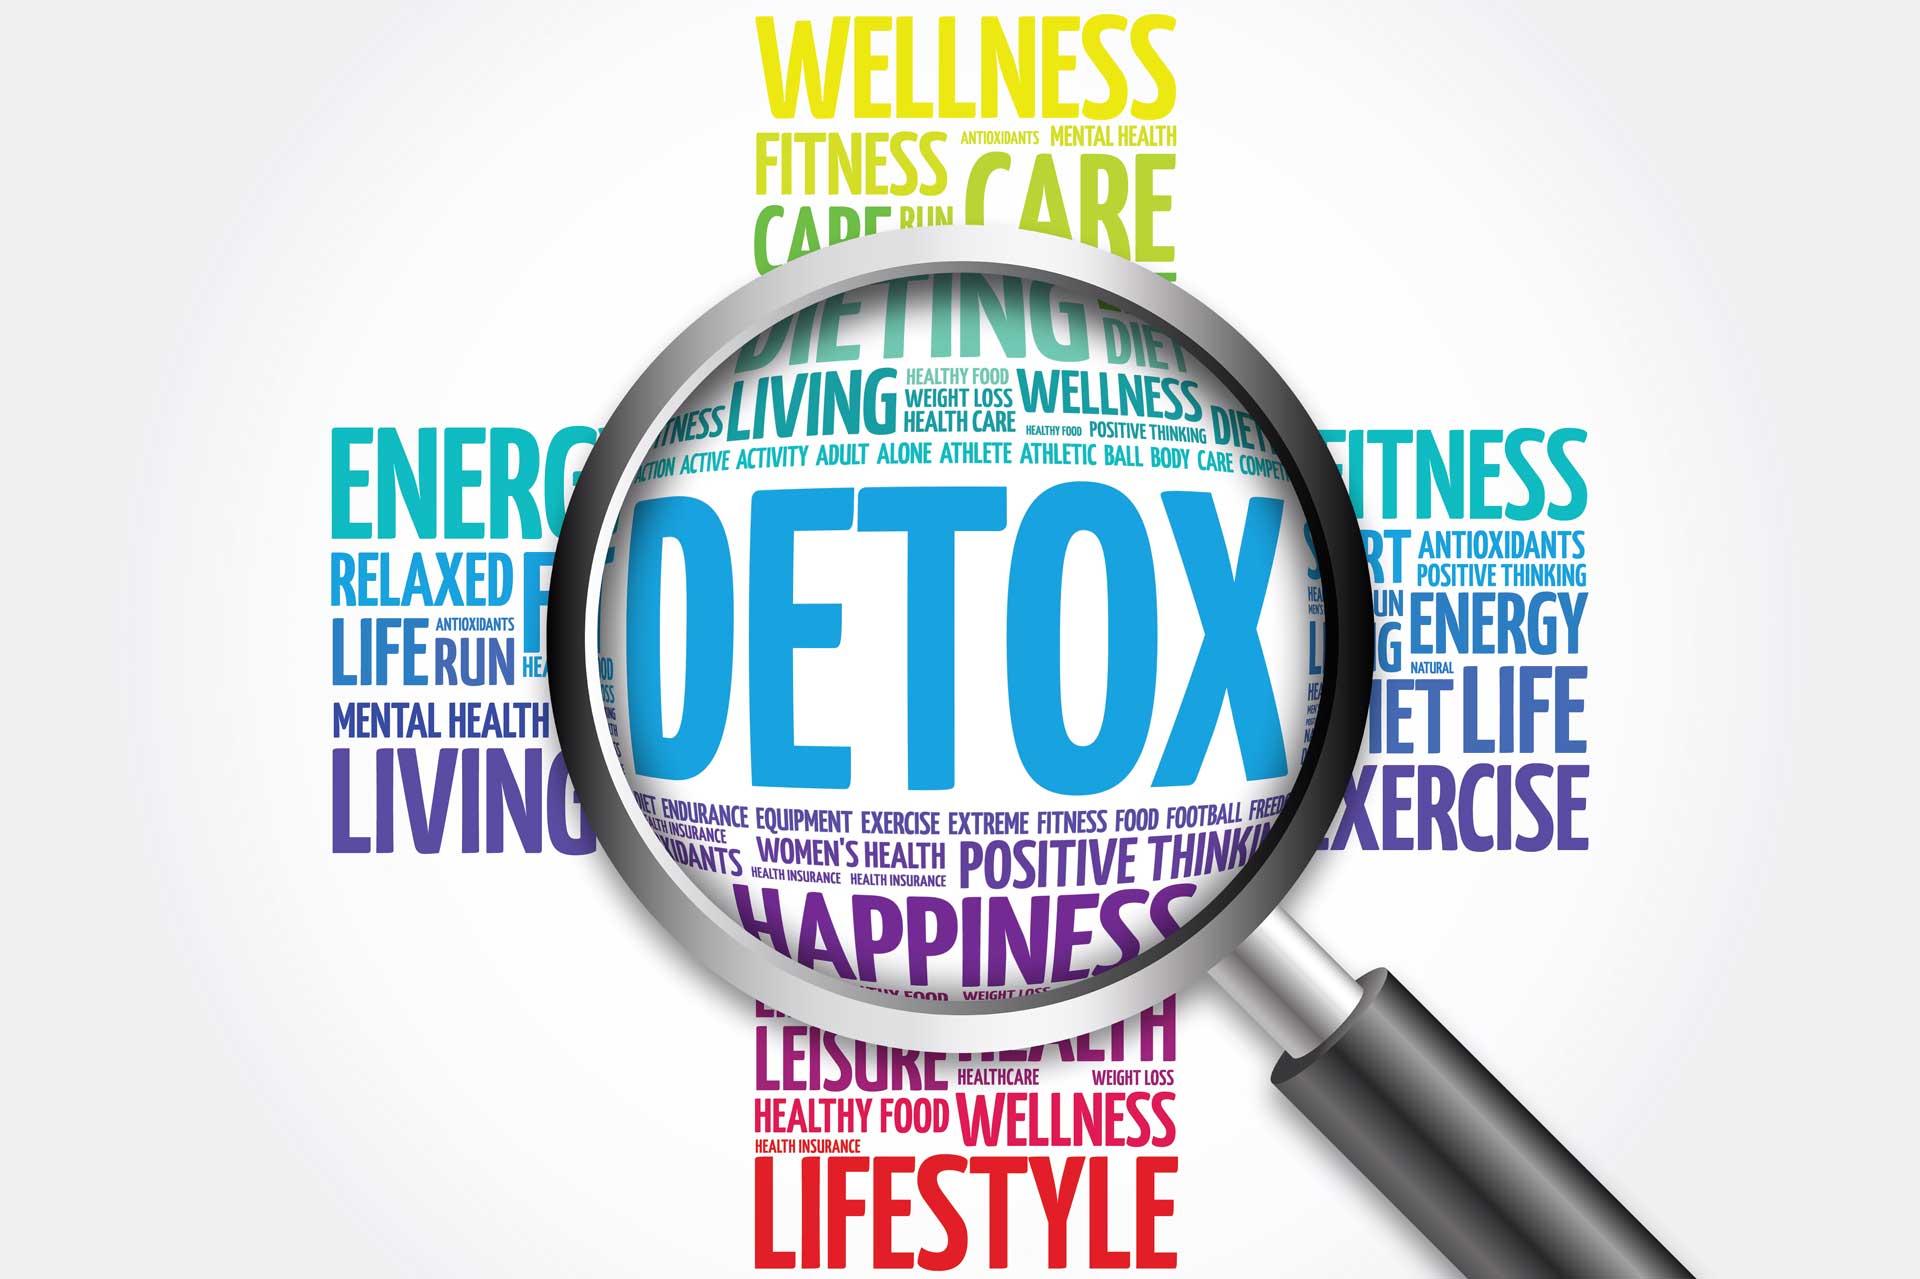 Episode 8: How To Detoxify Your Body From Trauma